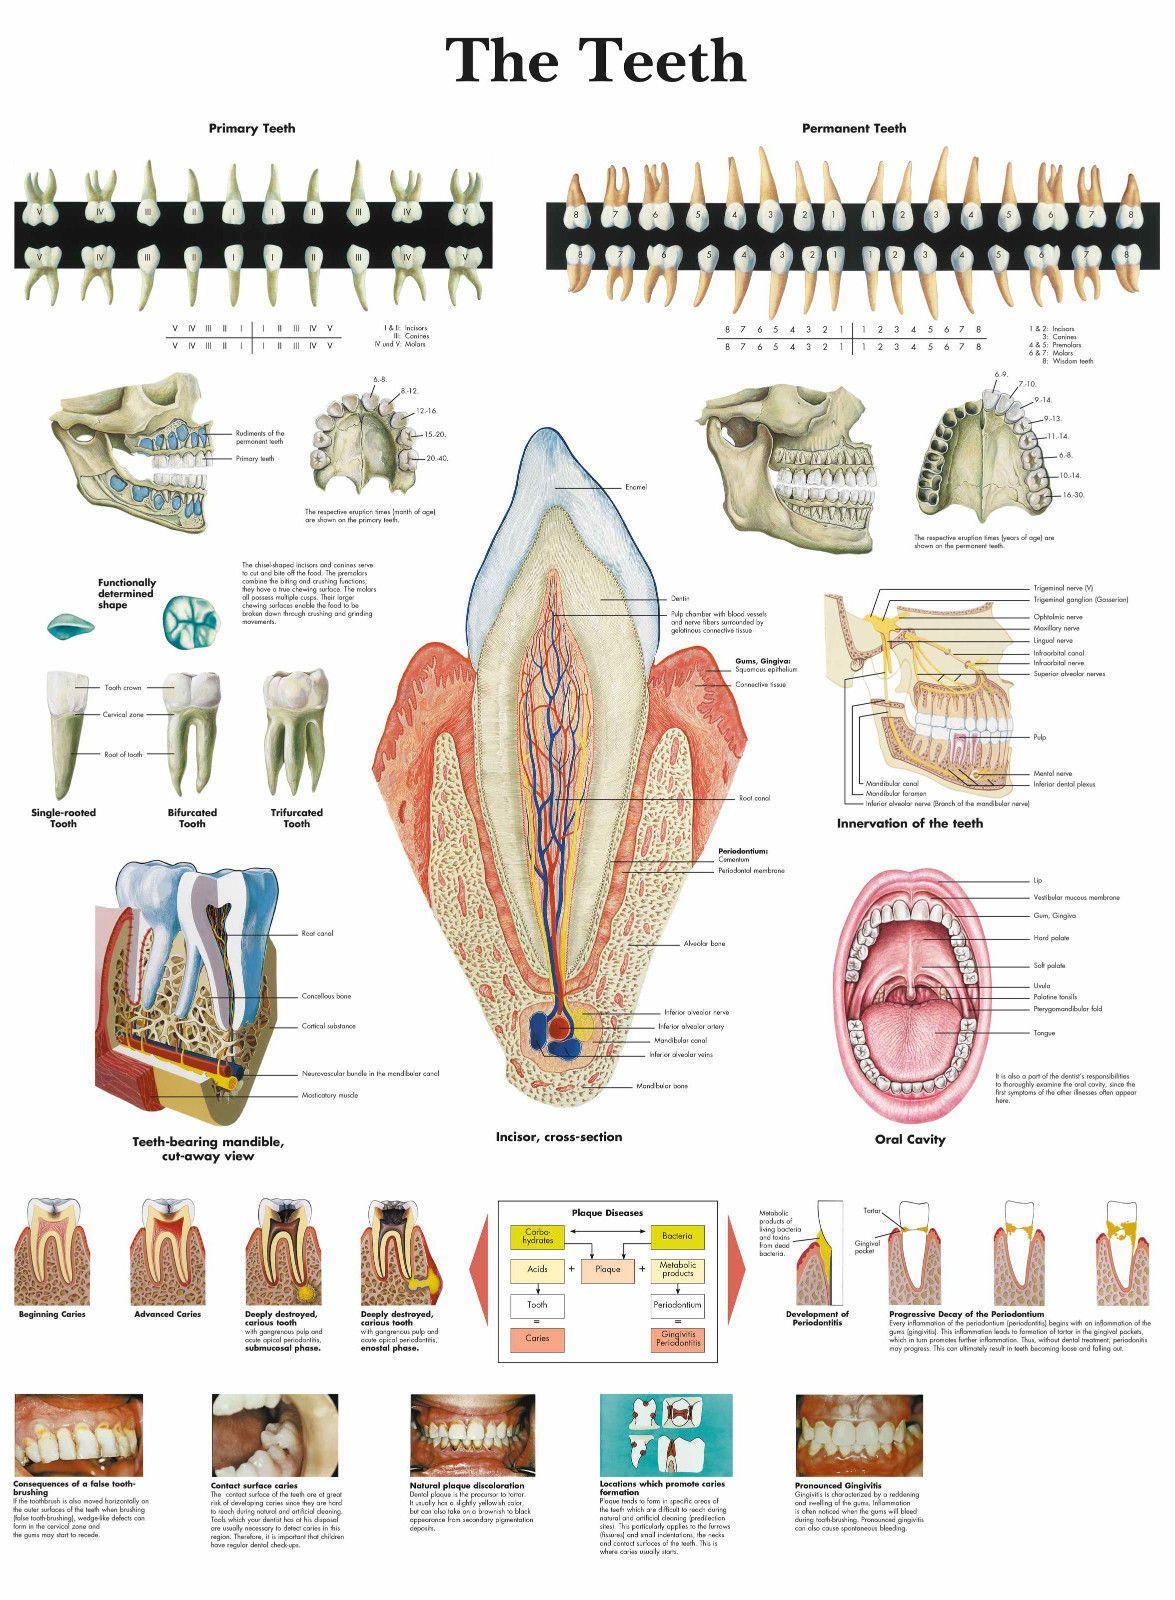 A3 Medical Poster The Human Teeth Text Book Anatomy Pathology